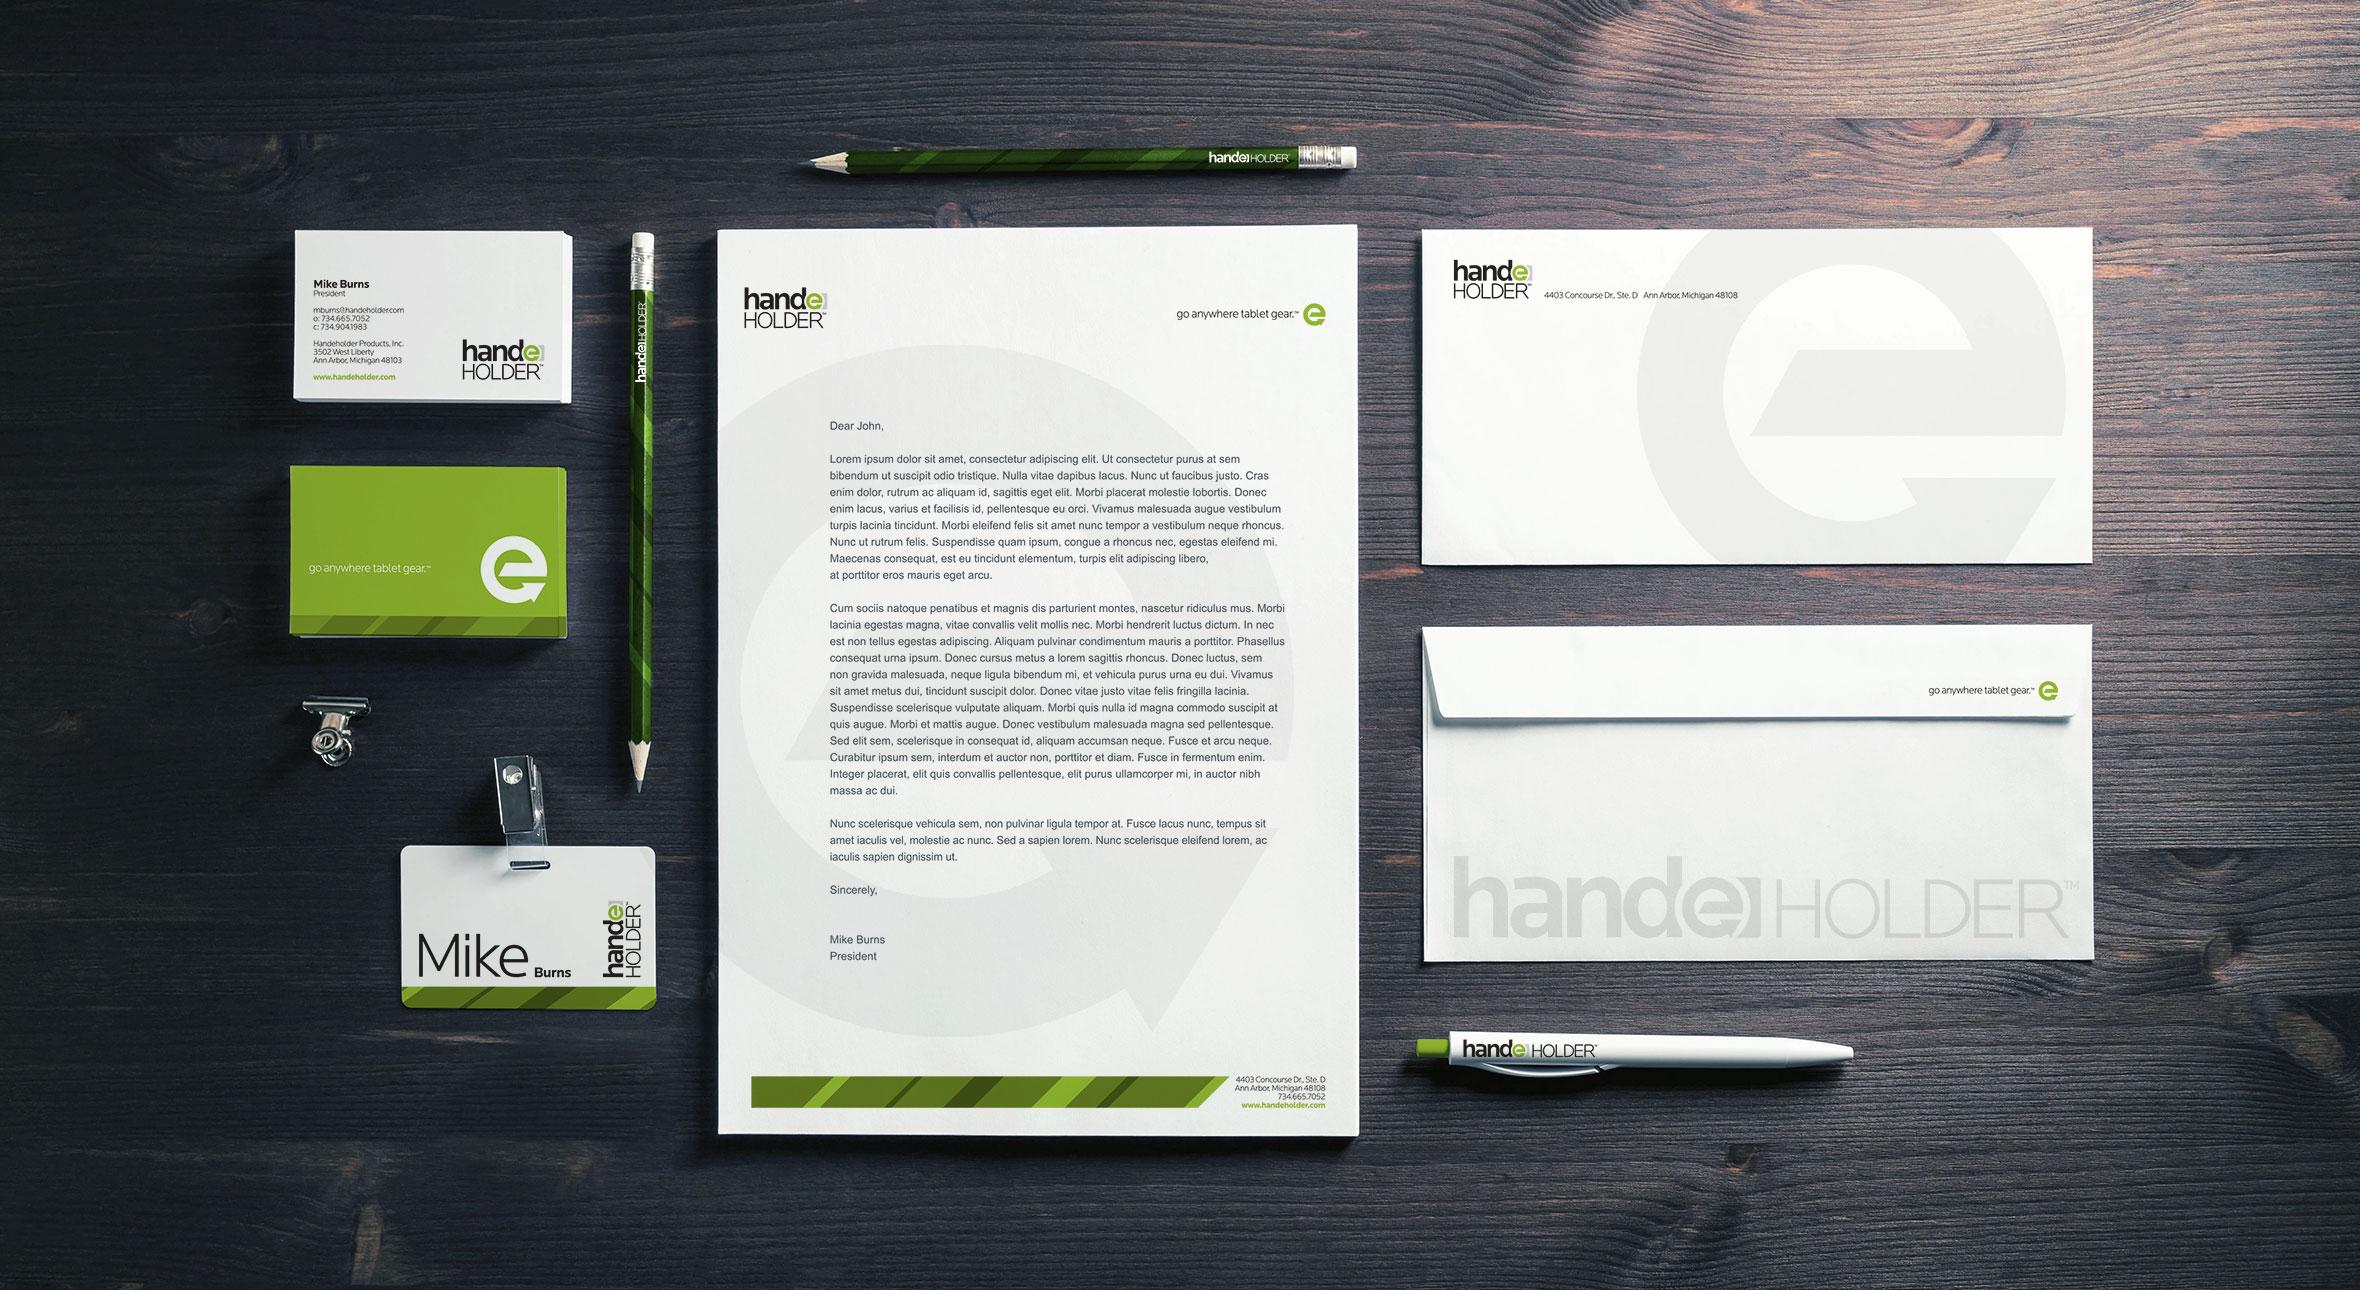 hand_e_holder_identity